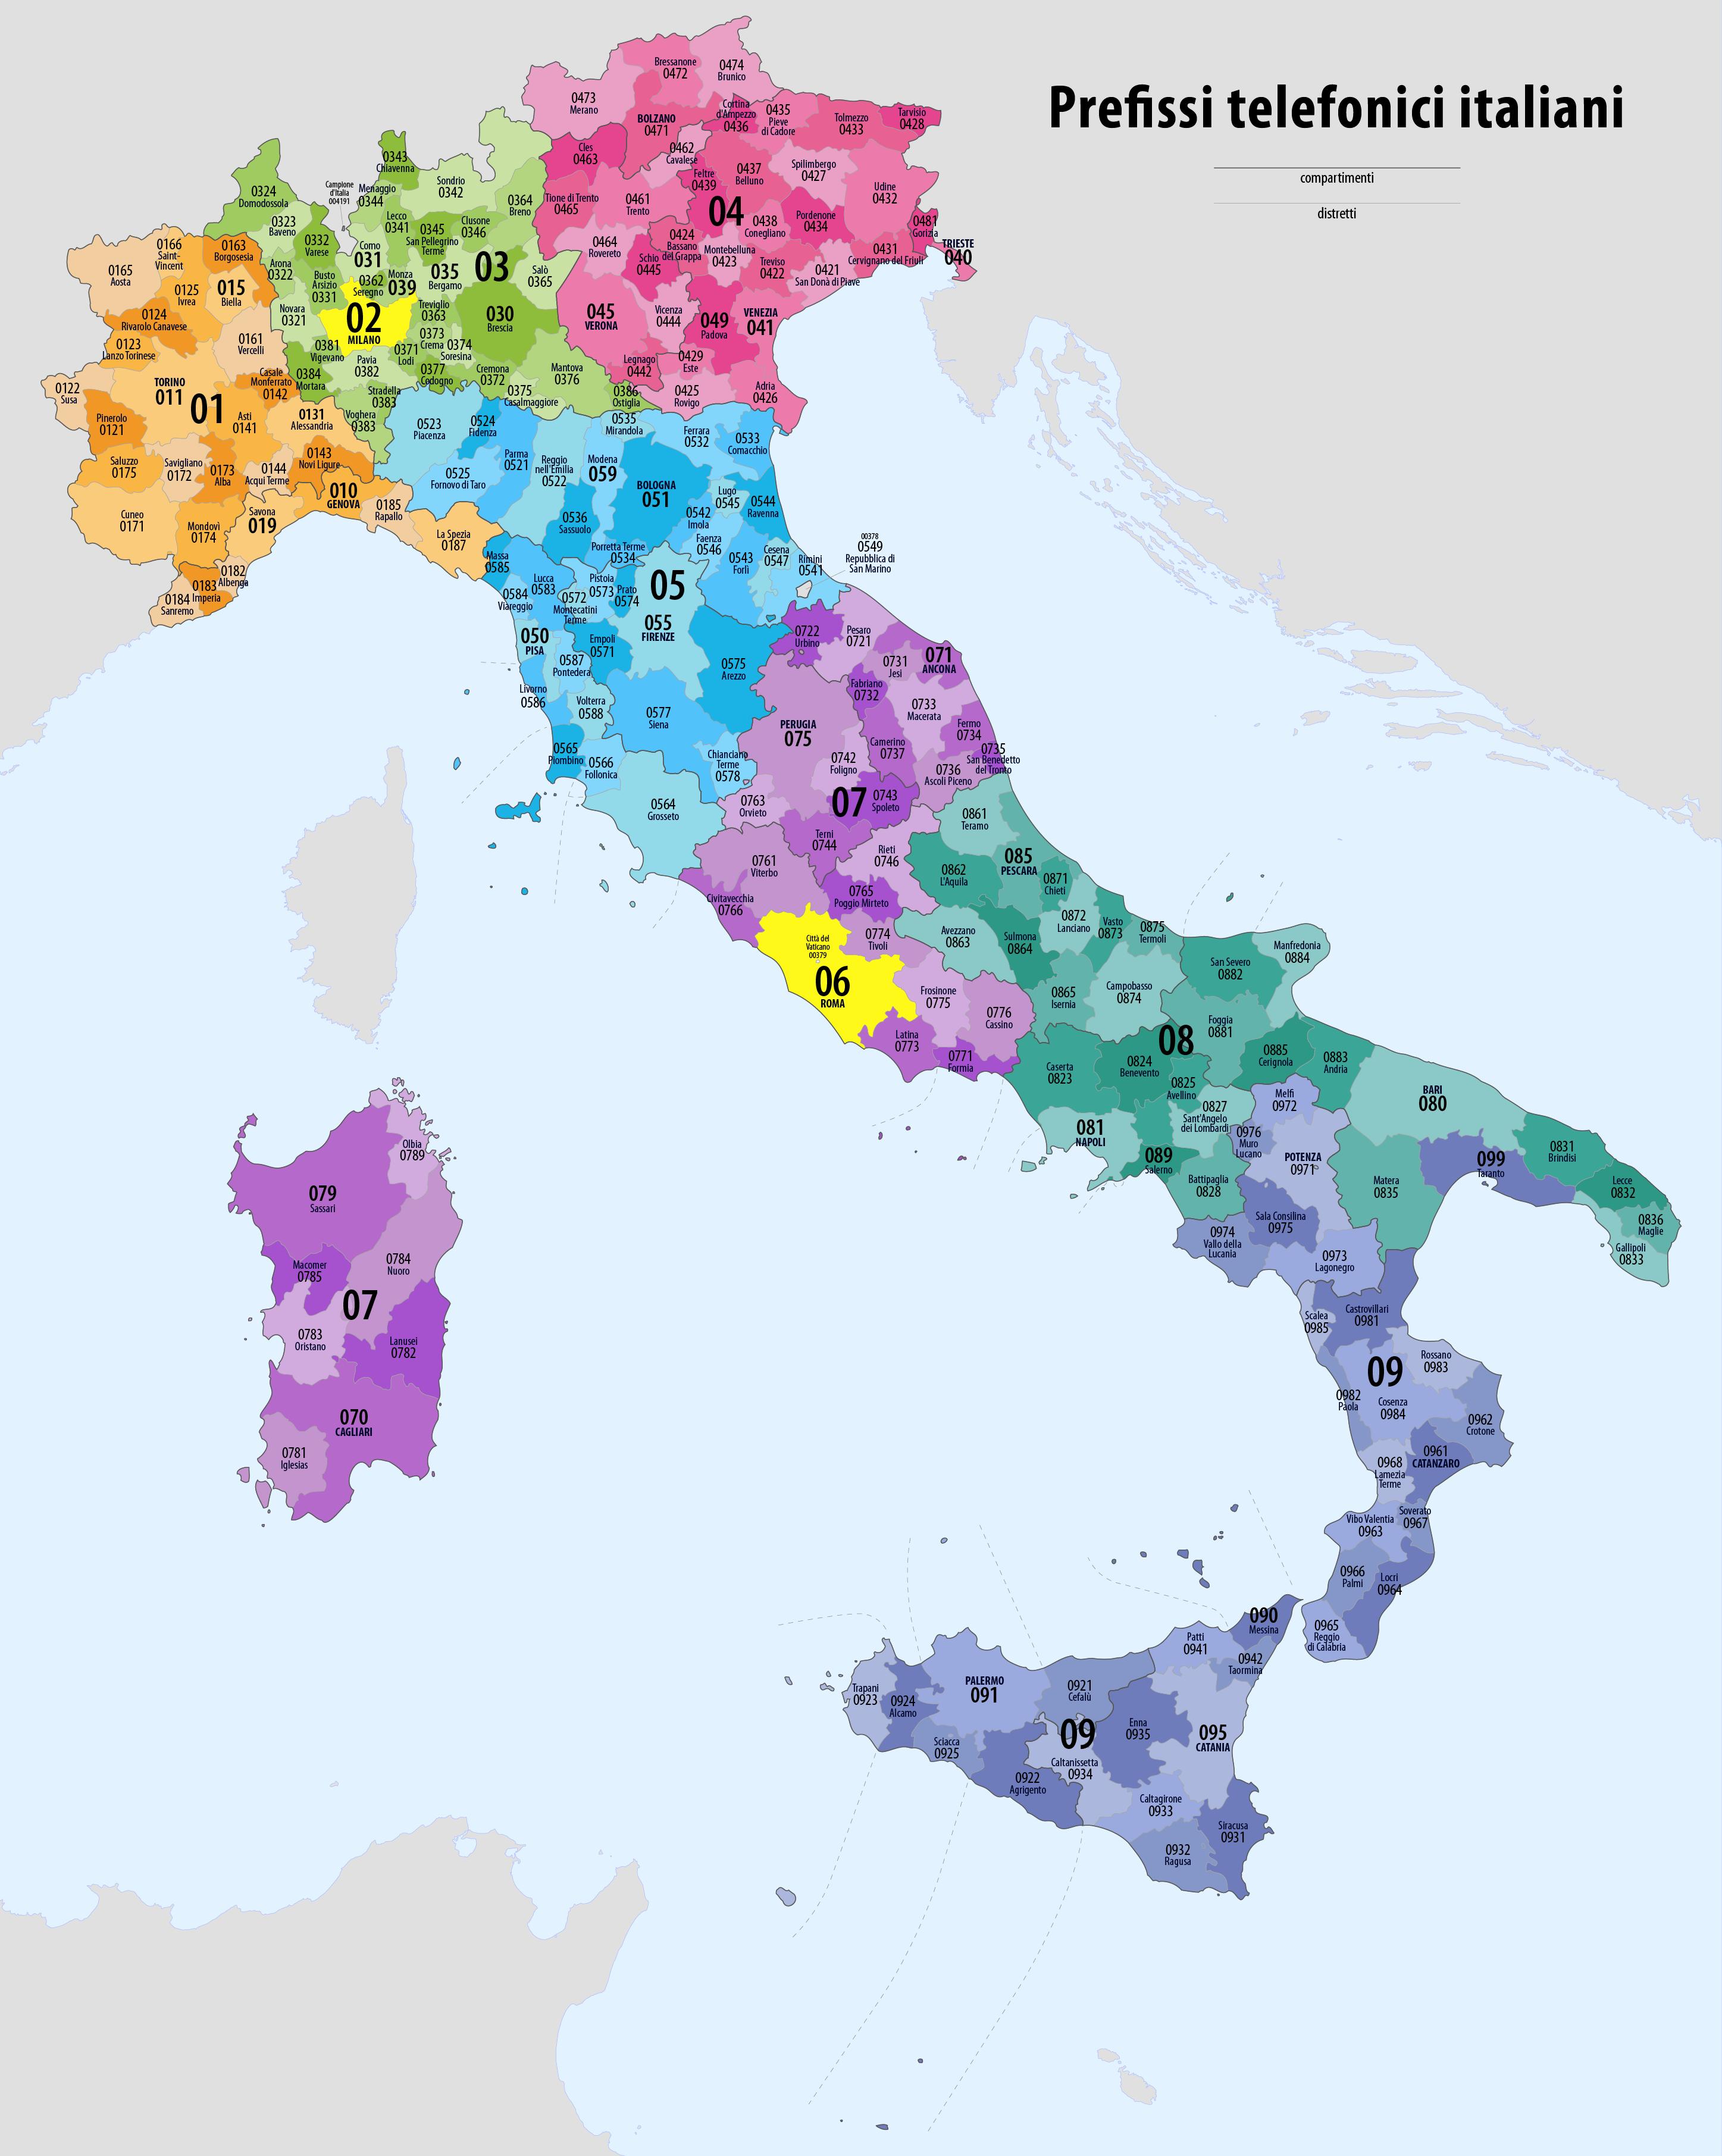 separation shoes 8b492 859ef Prefissi telefonici italiani - Wikipedia